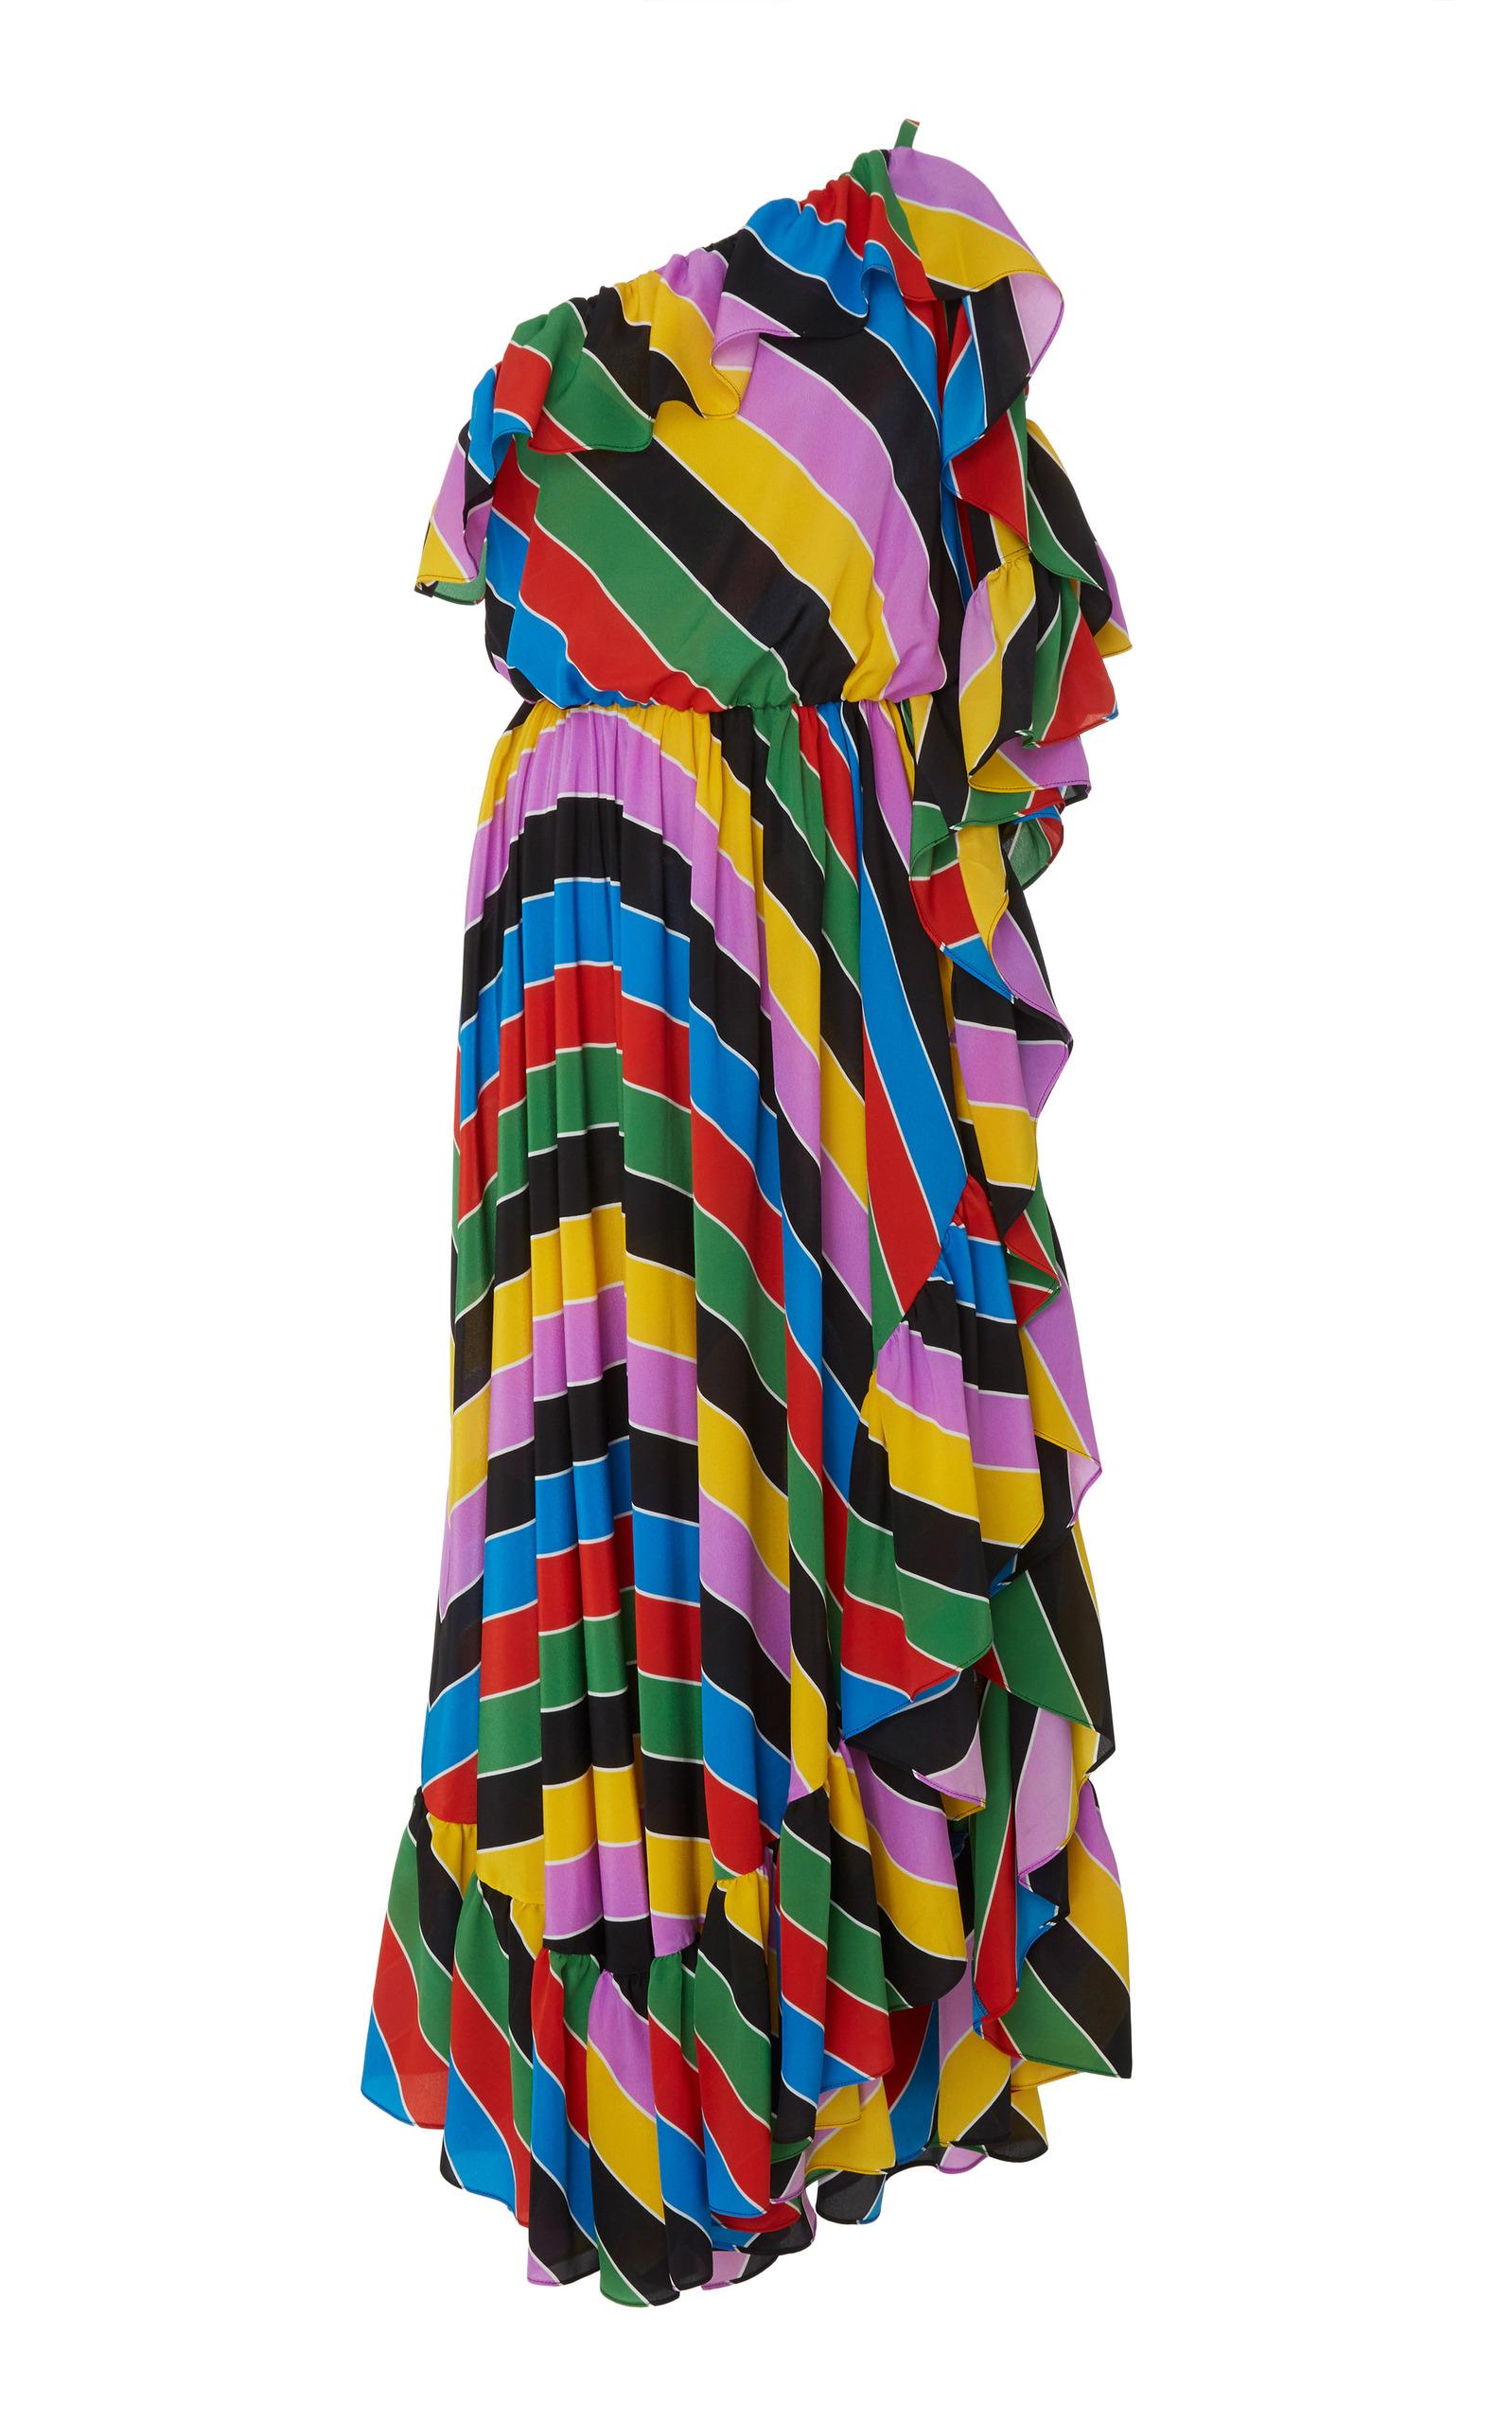 Amazing Price Cheap Price Asymmetric Ruffled Printed Silk Midi Dress Philosophy di Lorenzo Serafini Cheap Sale Wide Range Of Low Cost Quality Free Shipping For Sale Outlet 100% Original p4pcU1Cg